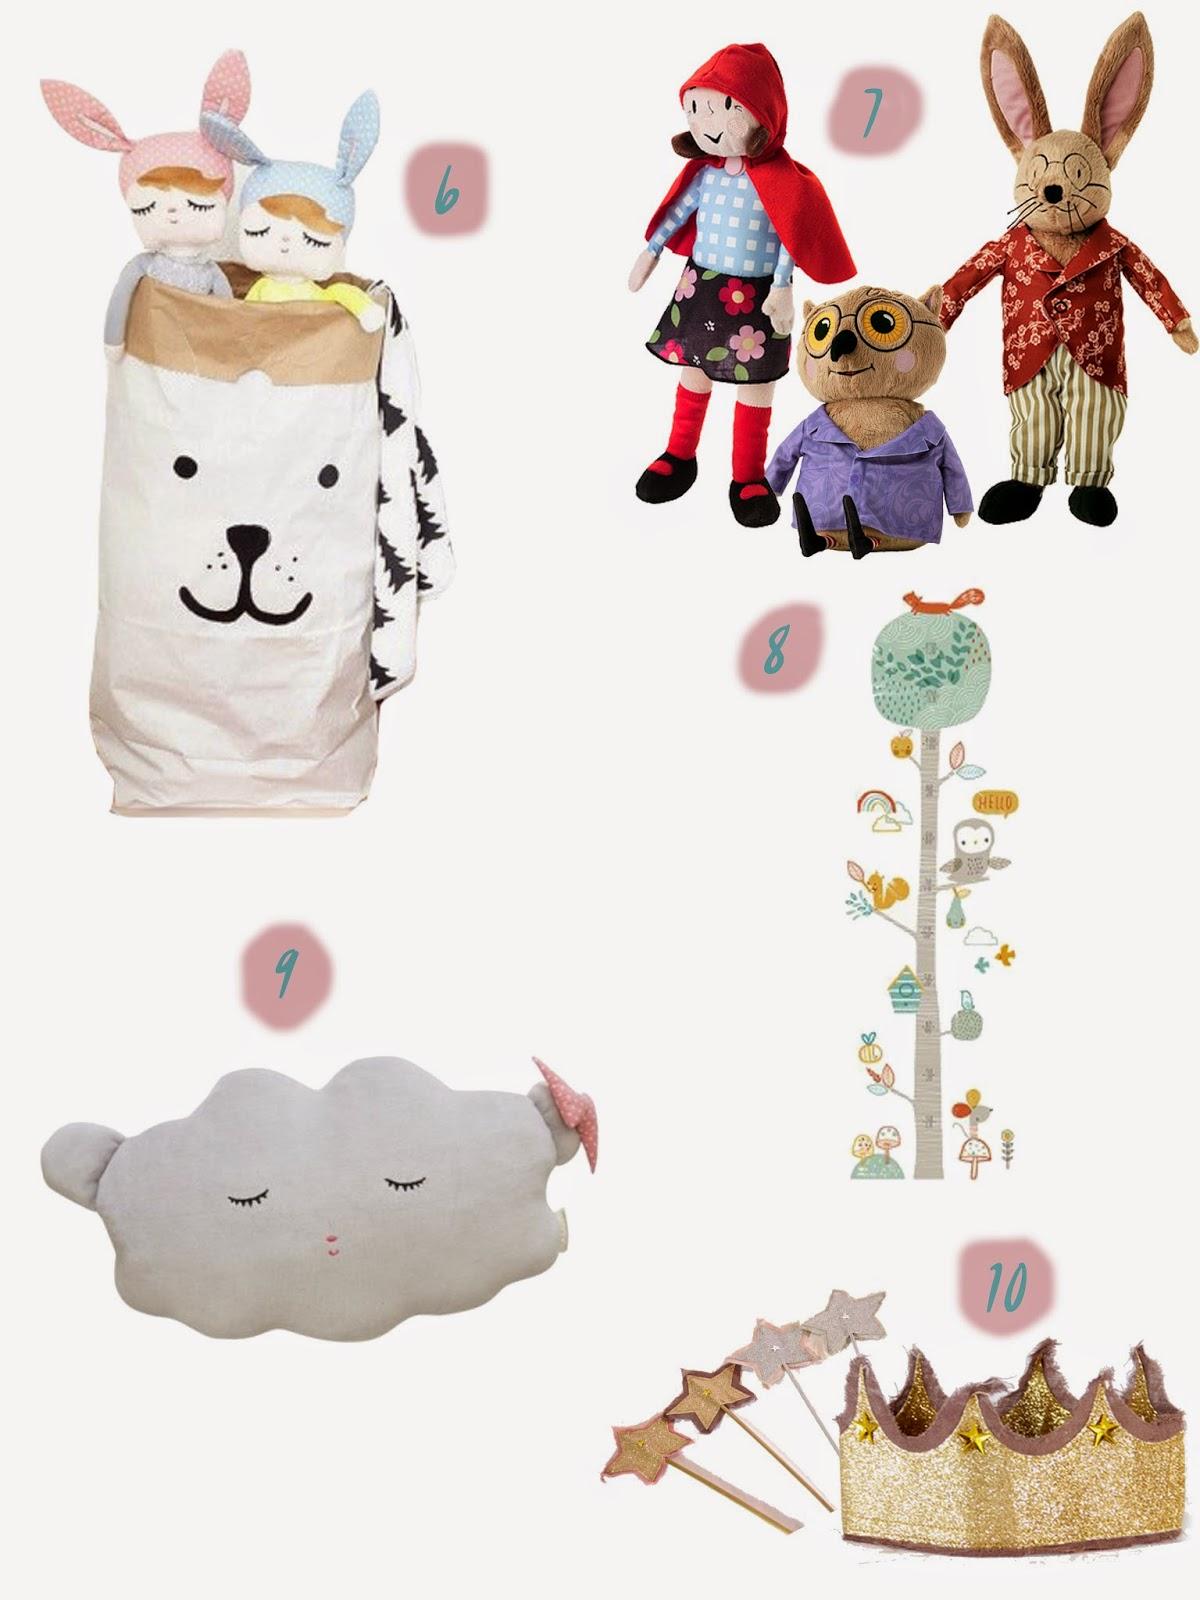 bolsa_mrwonderful-peluches_ikea-vinilo_kenay-cojin_nube-belandshop_juguetes-